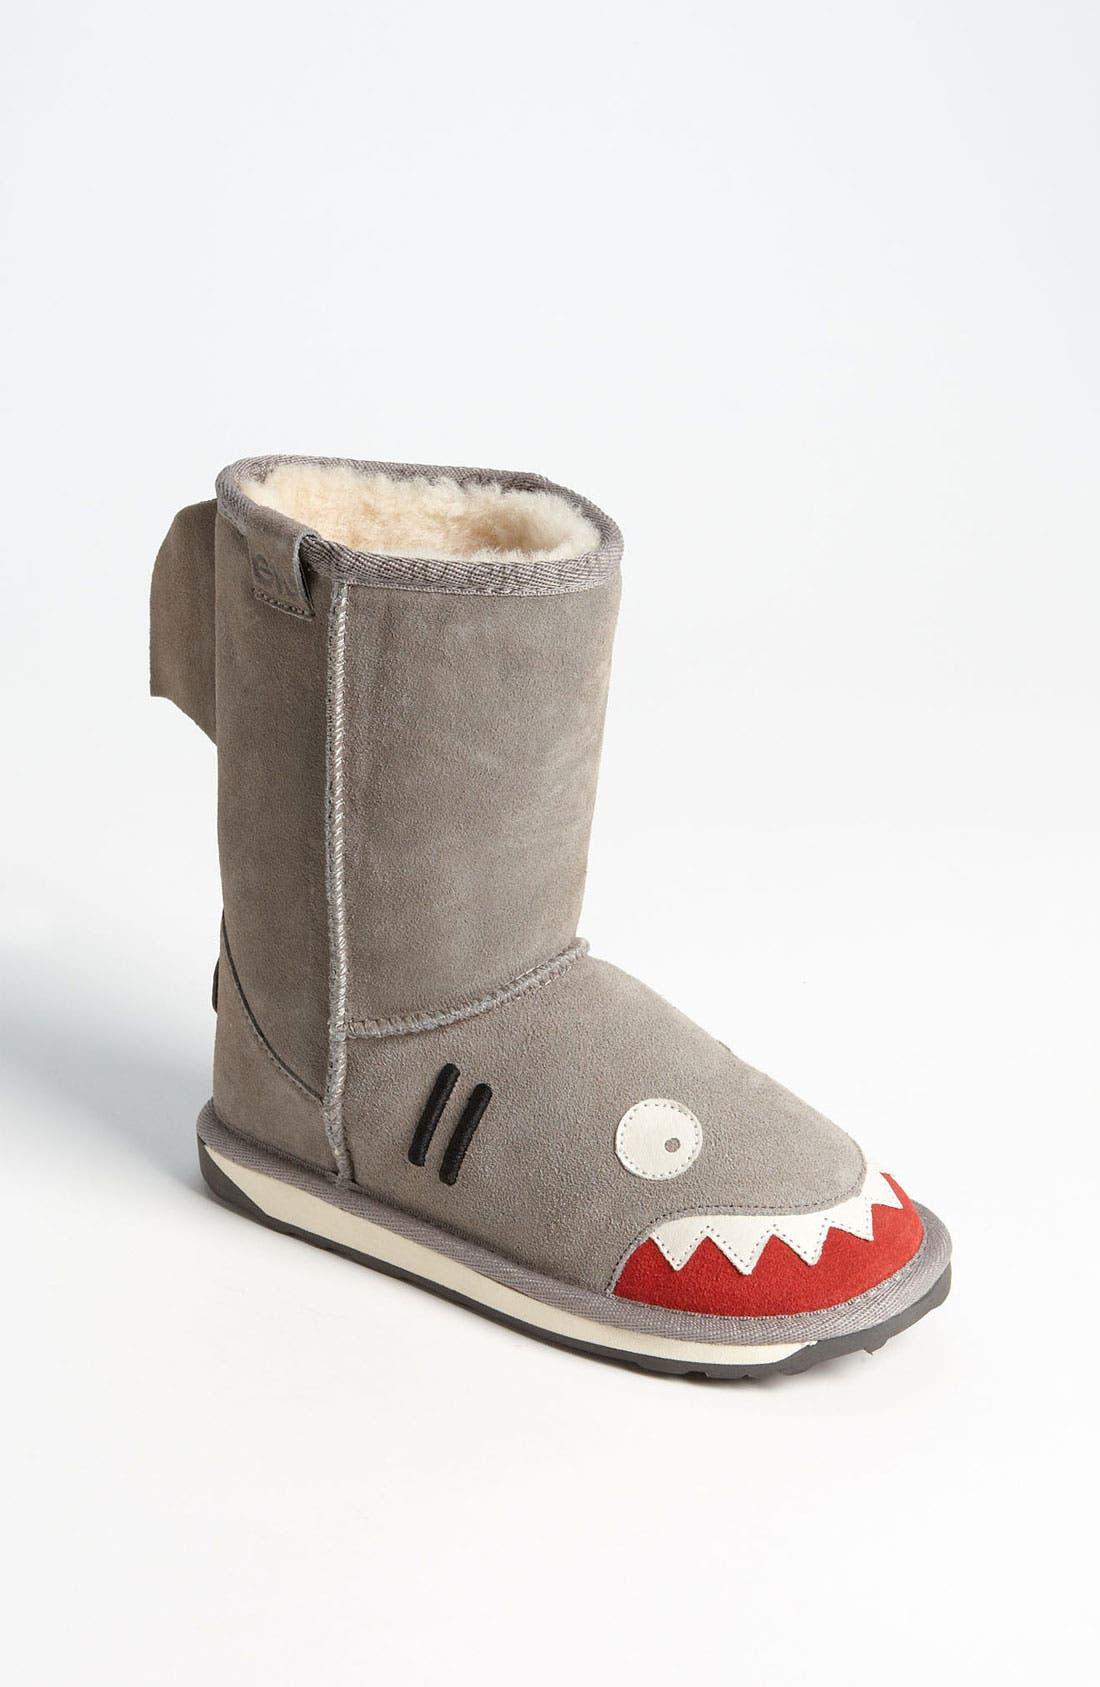 Main Image - EMU Australia 'Little Creatures - Shark' Boot (Toddler, Little Kid & Big Kid)